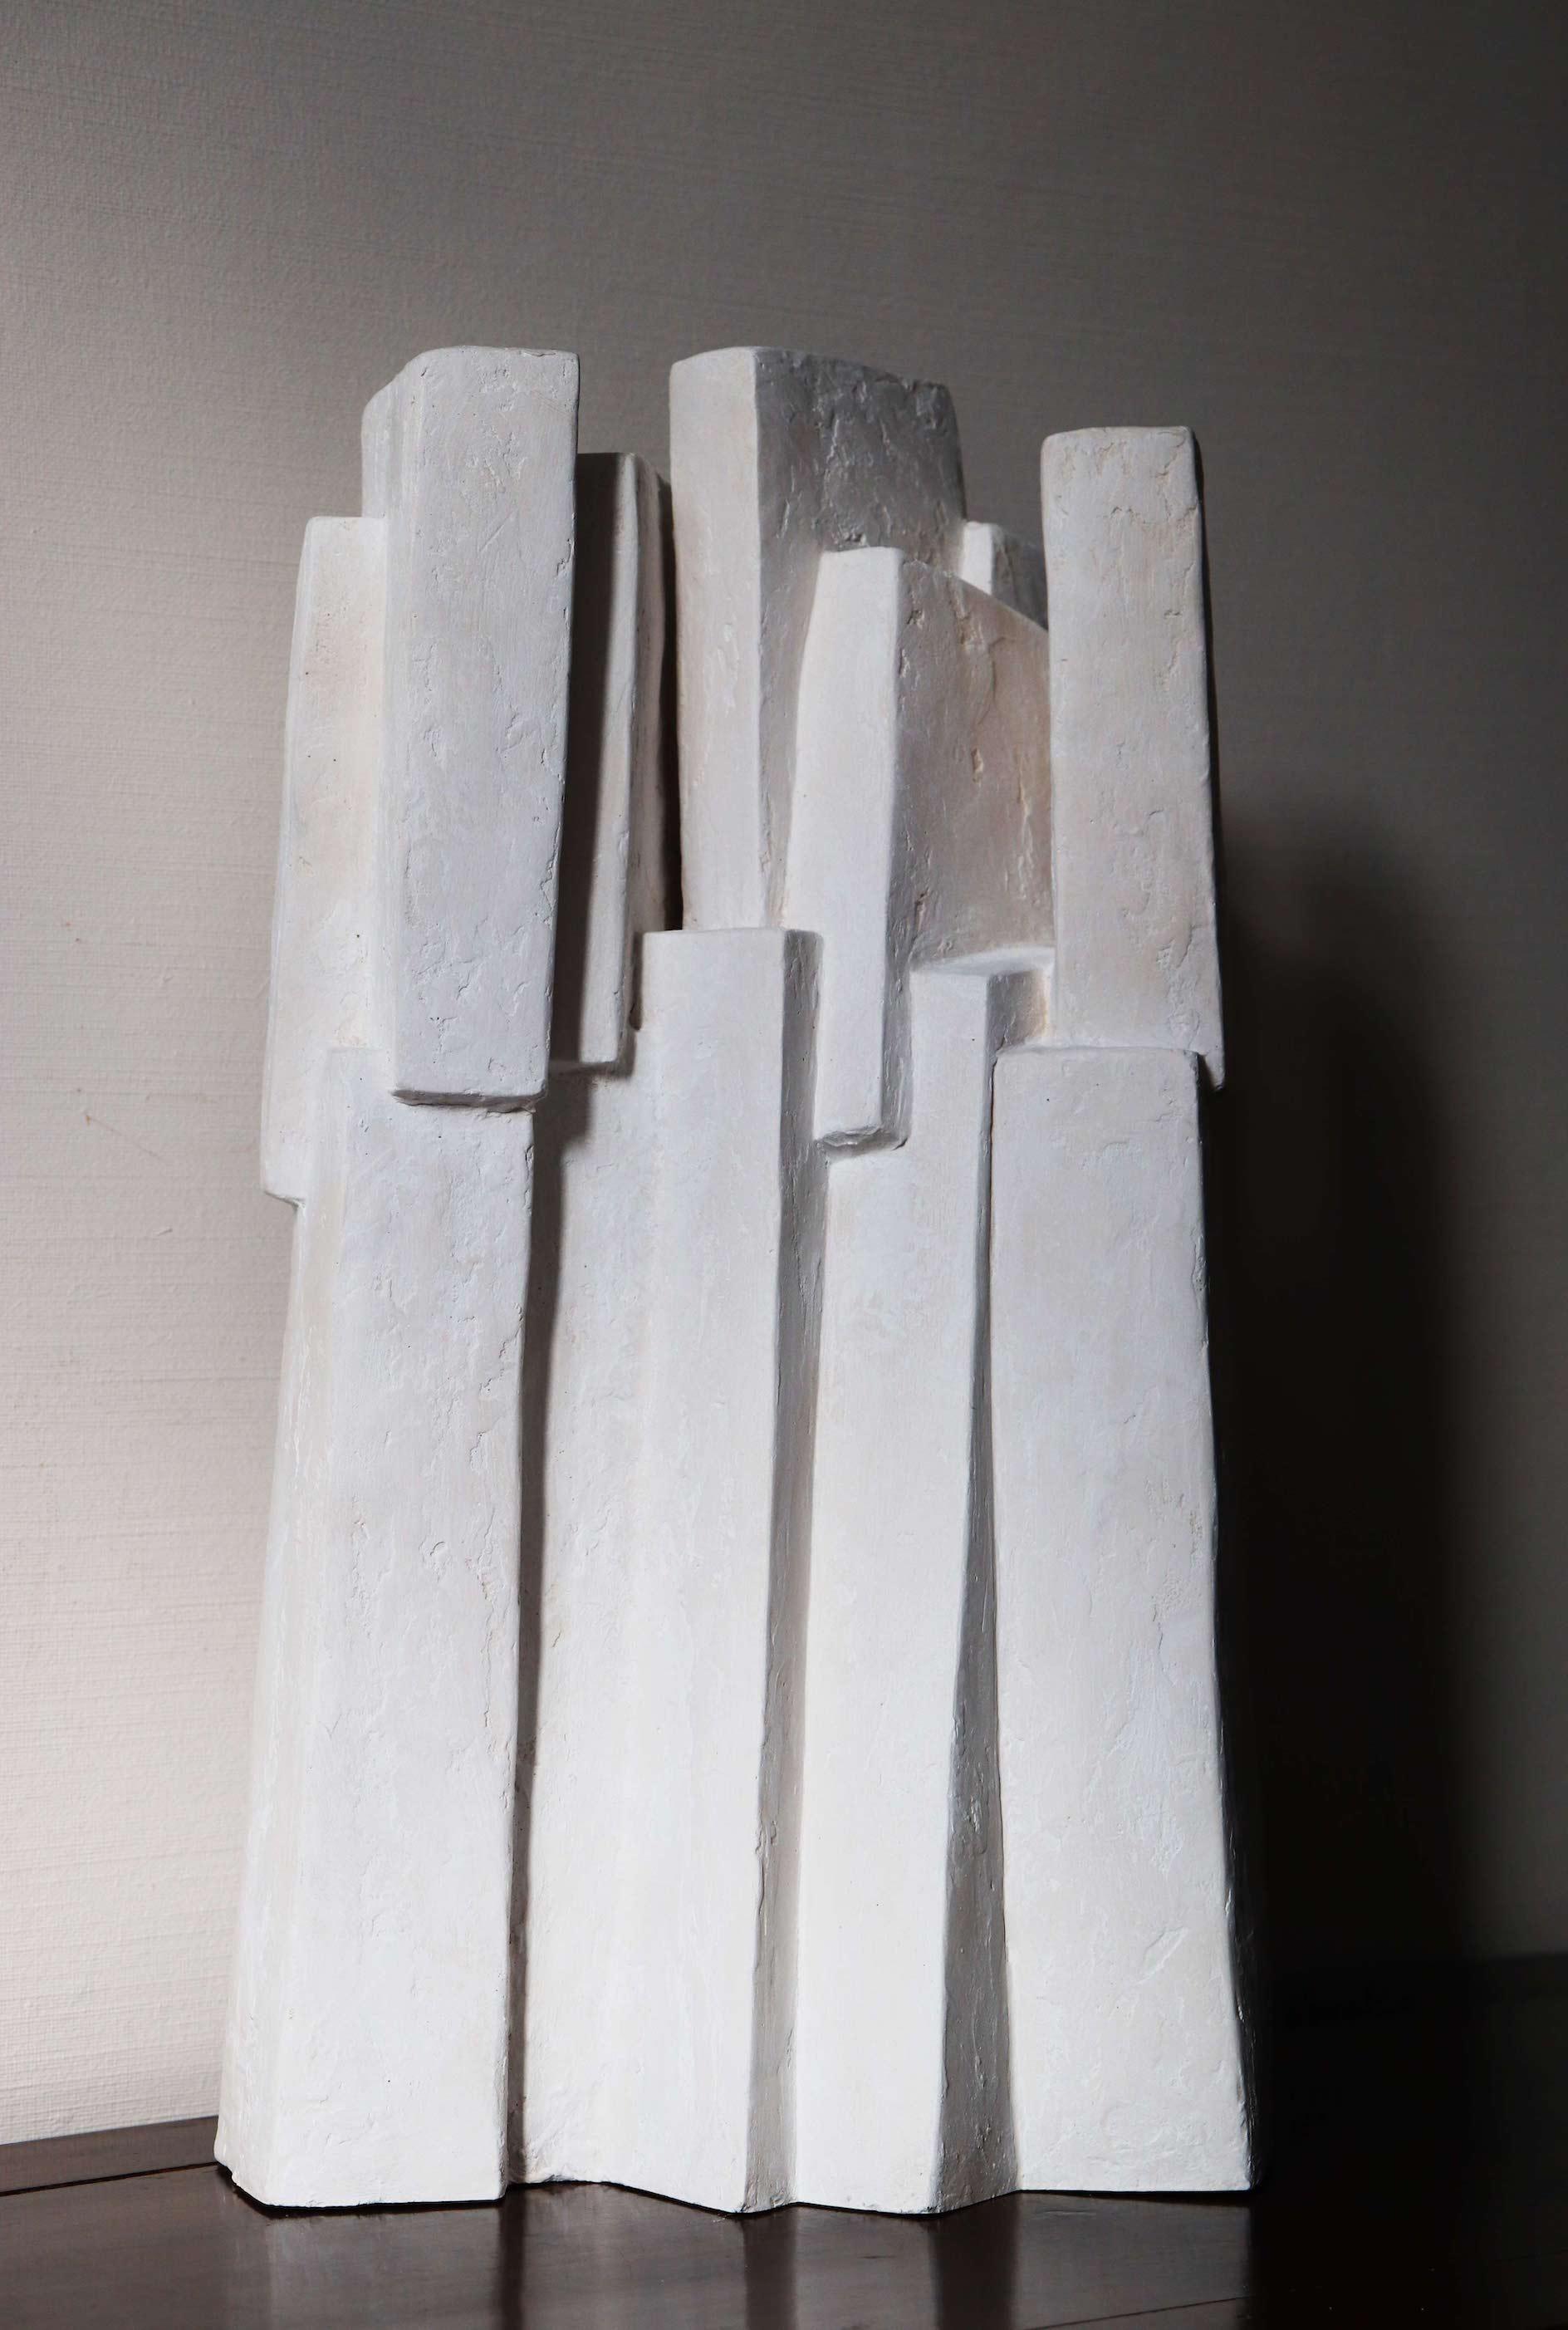 Ensemble III (Geometric Sculpture, Resin)